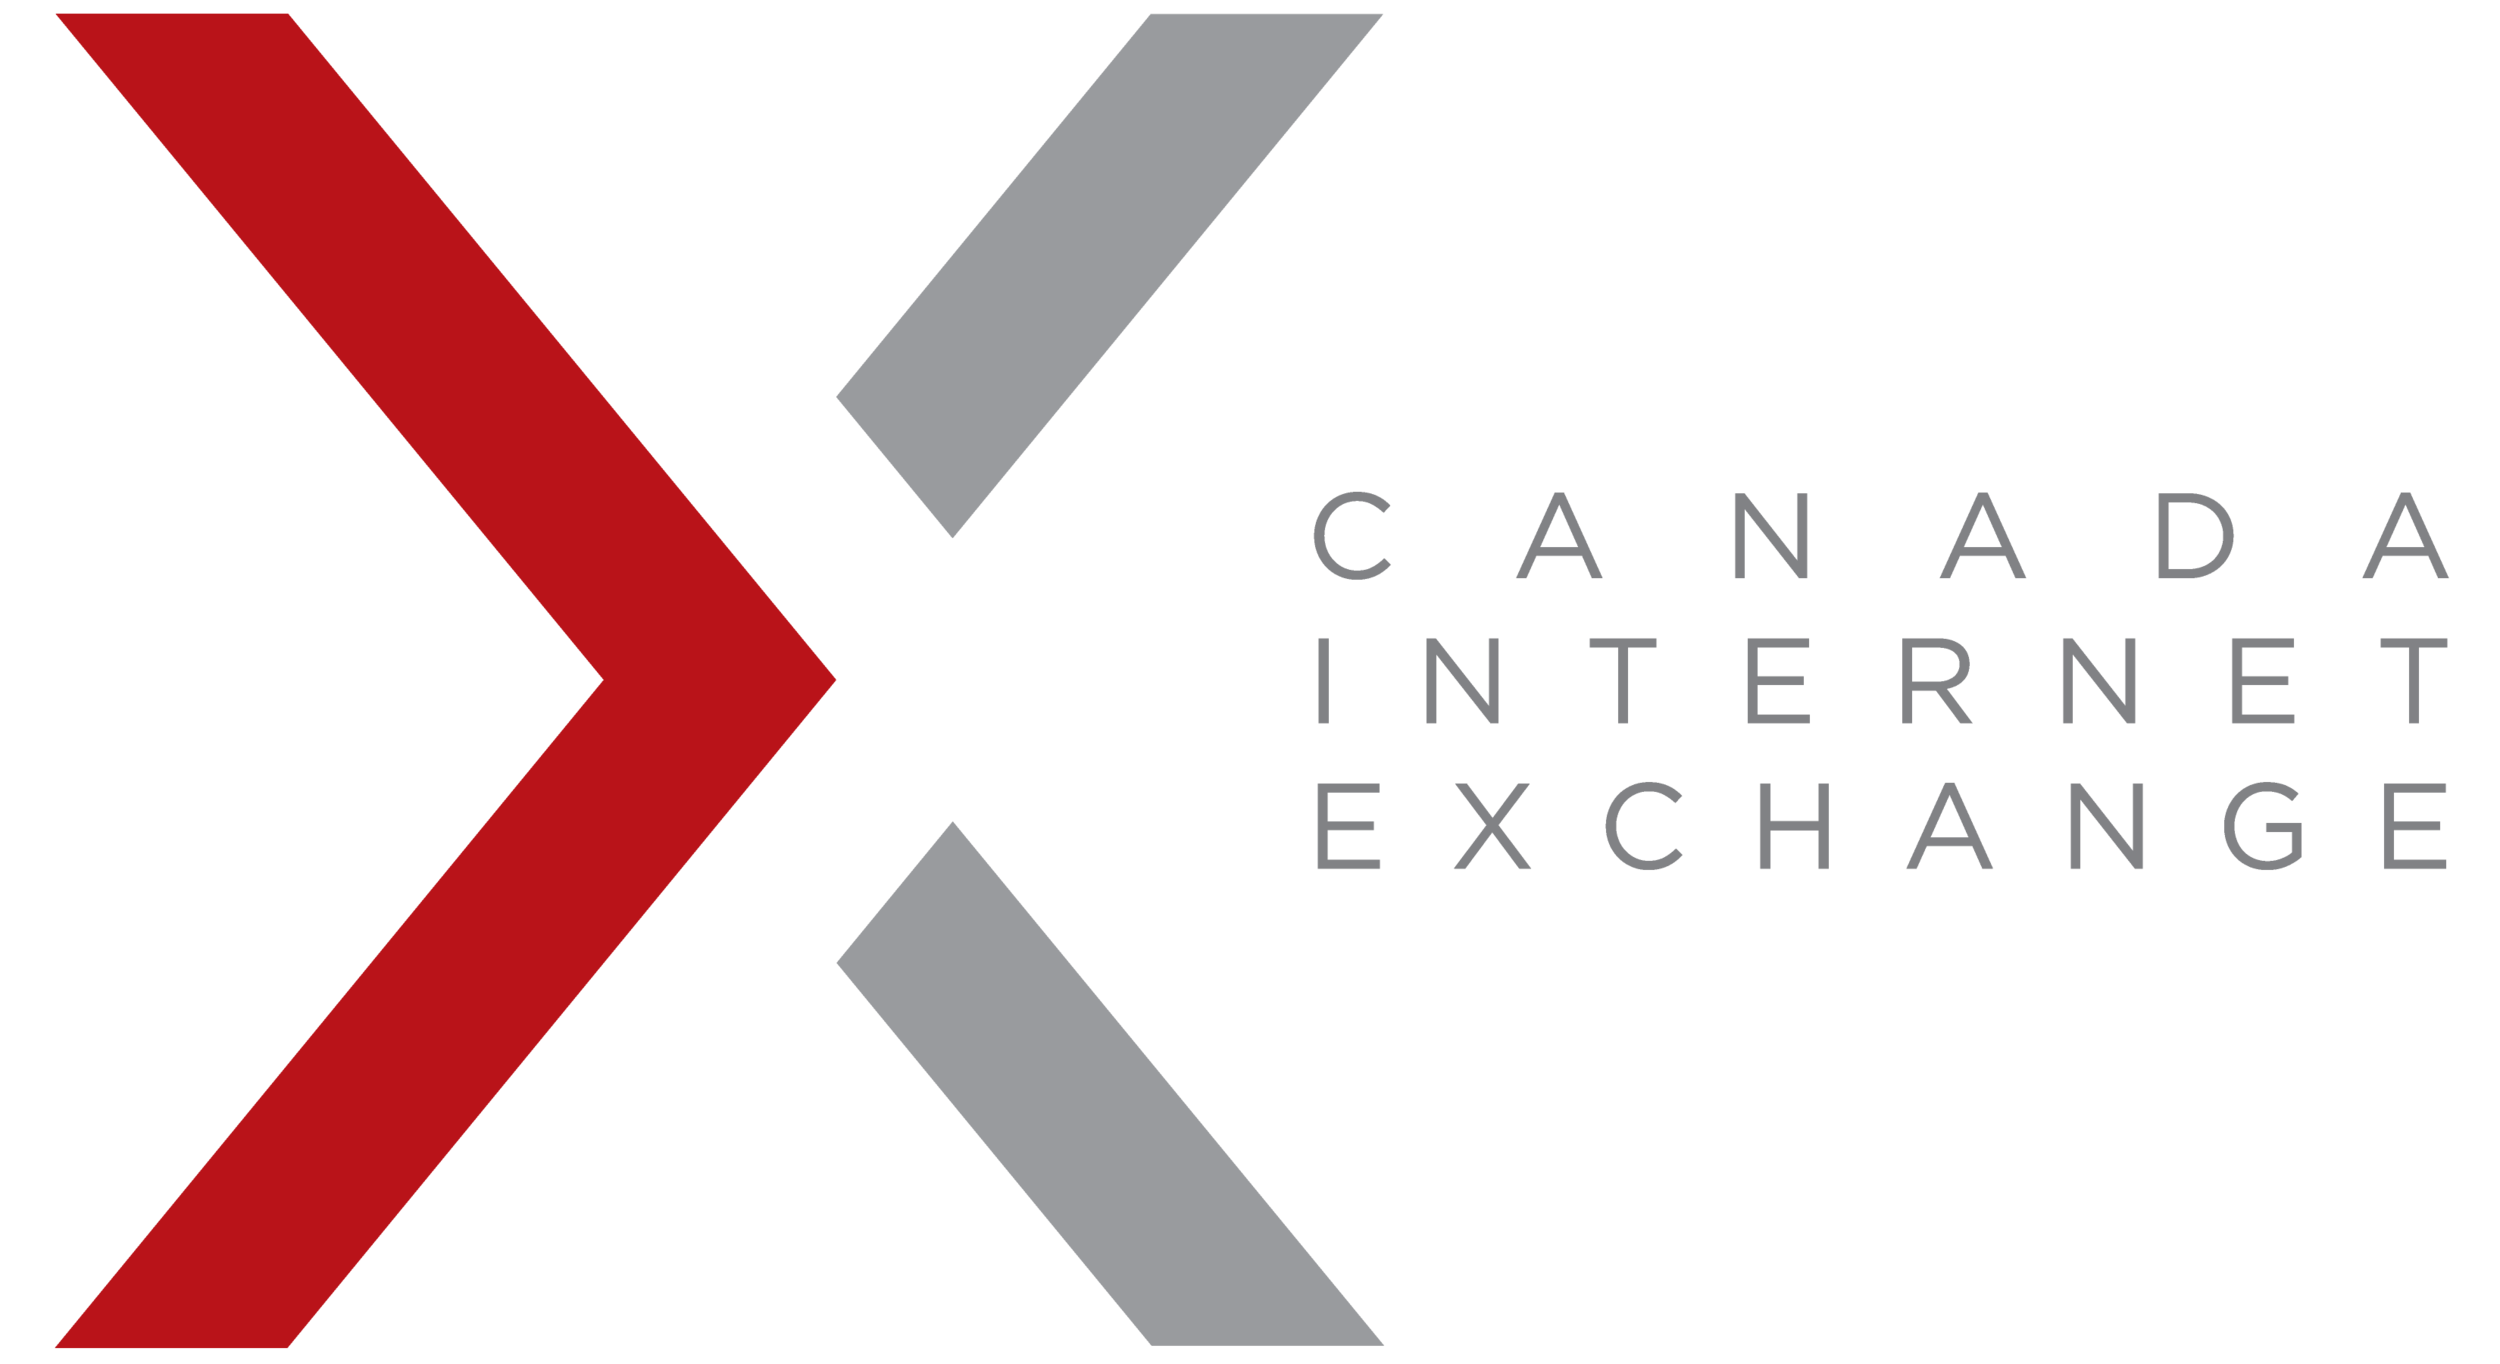 Canada Internet Exhange - Logo-01.png